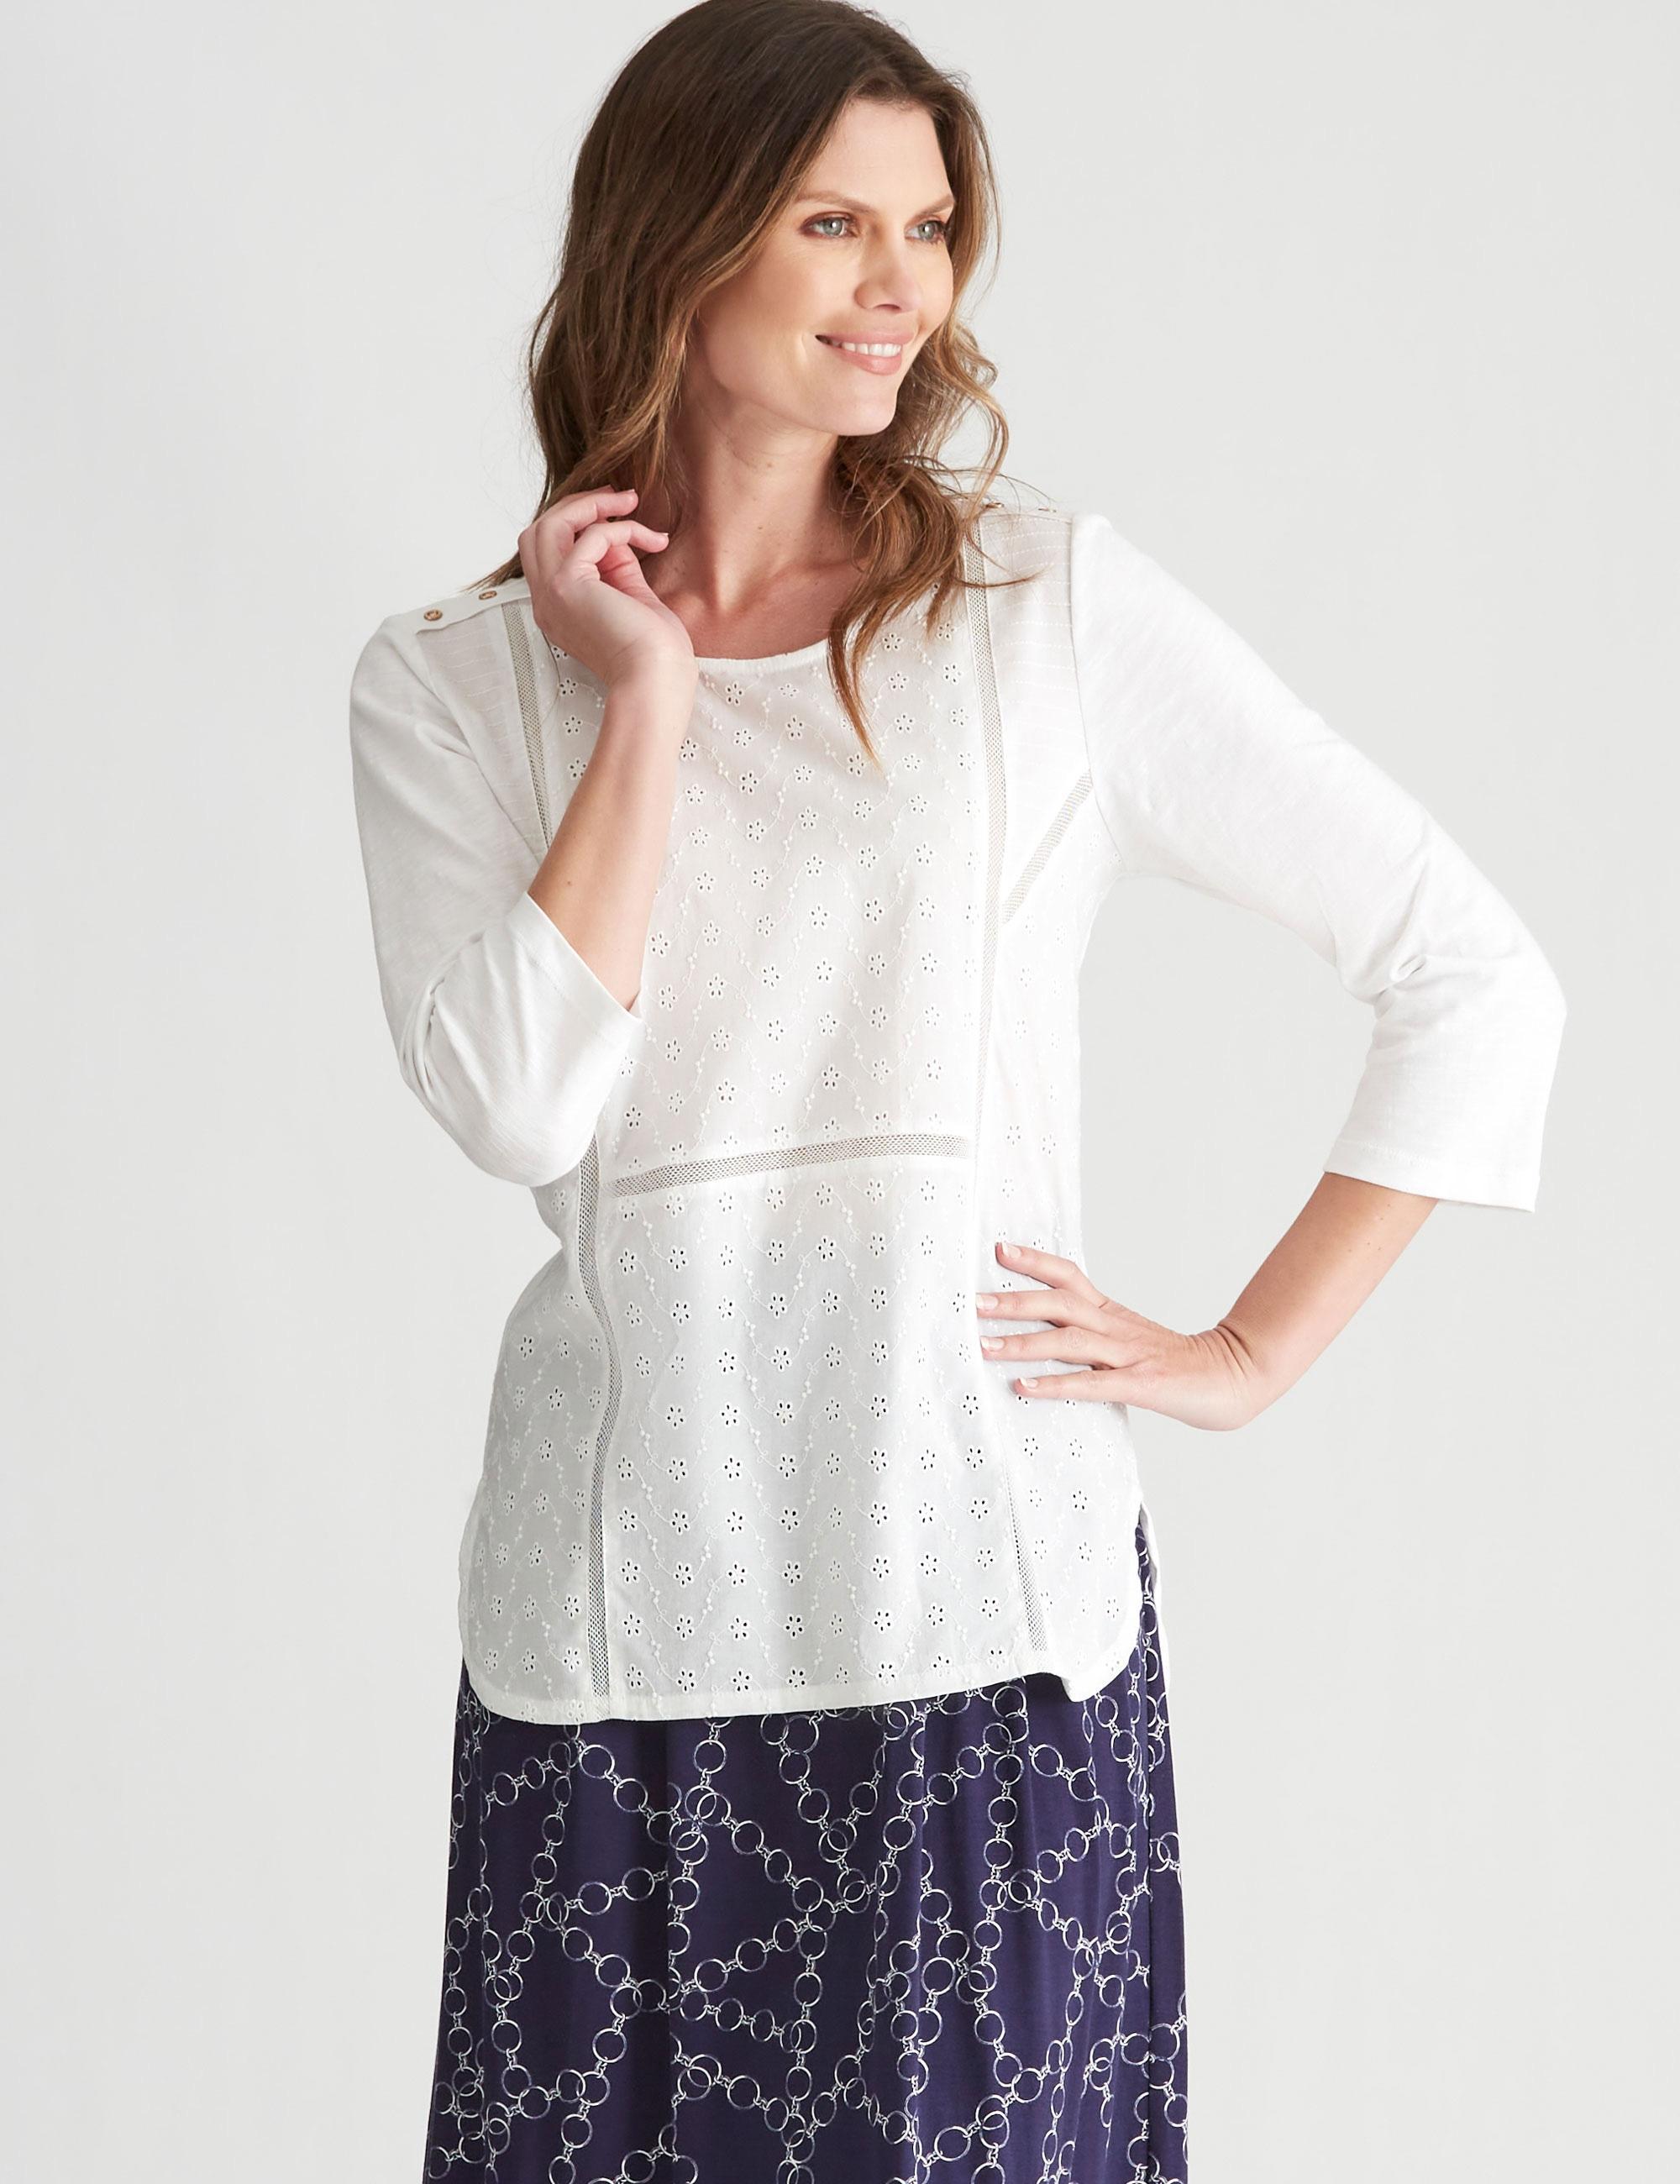 1056129100 1 - Women Fashion